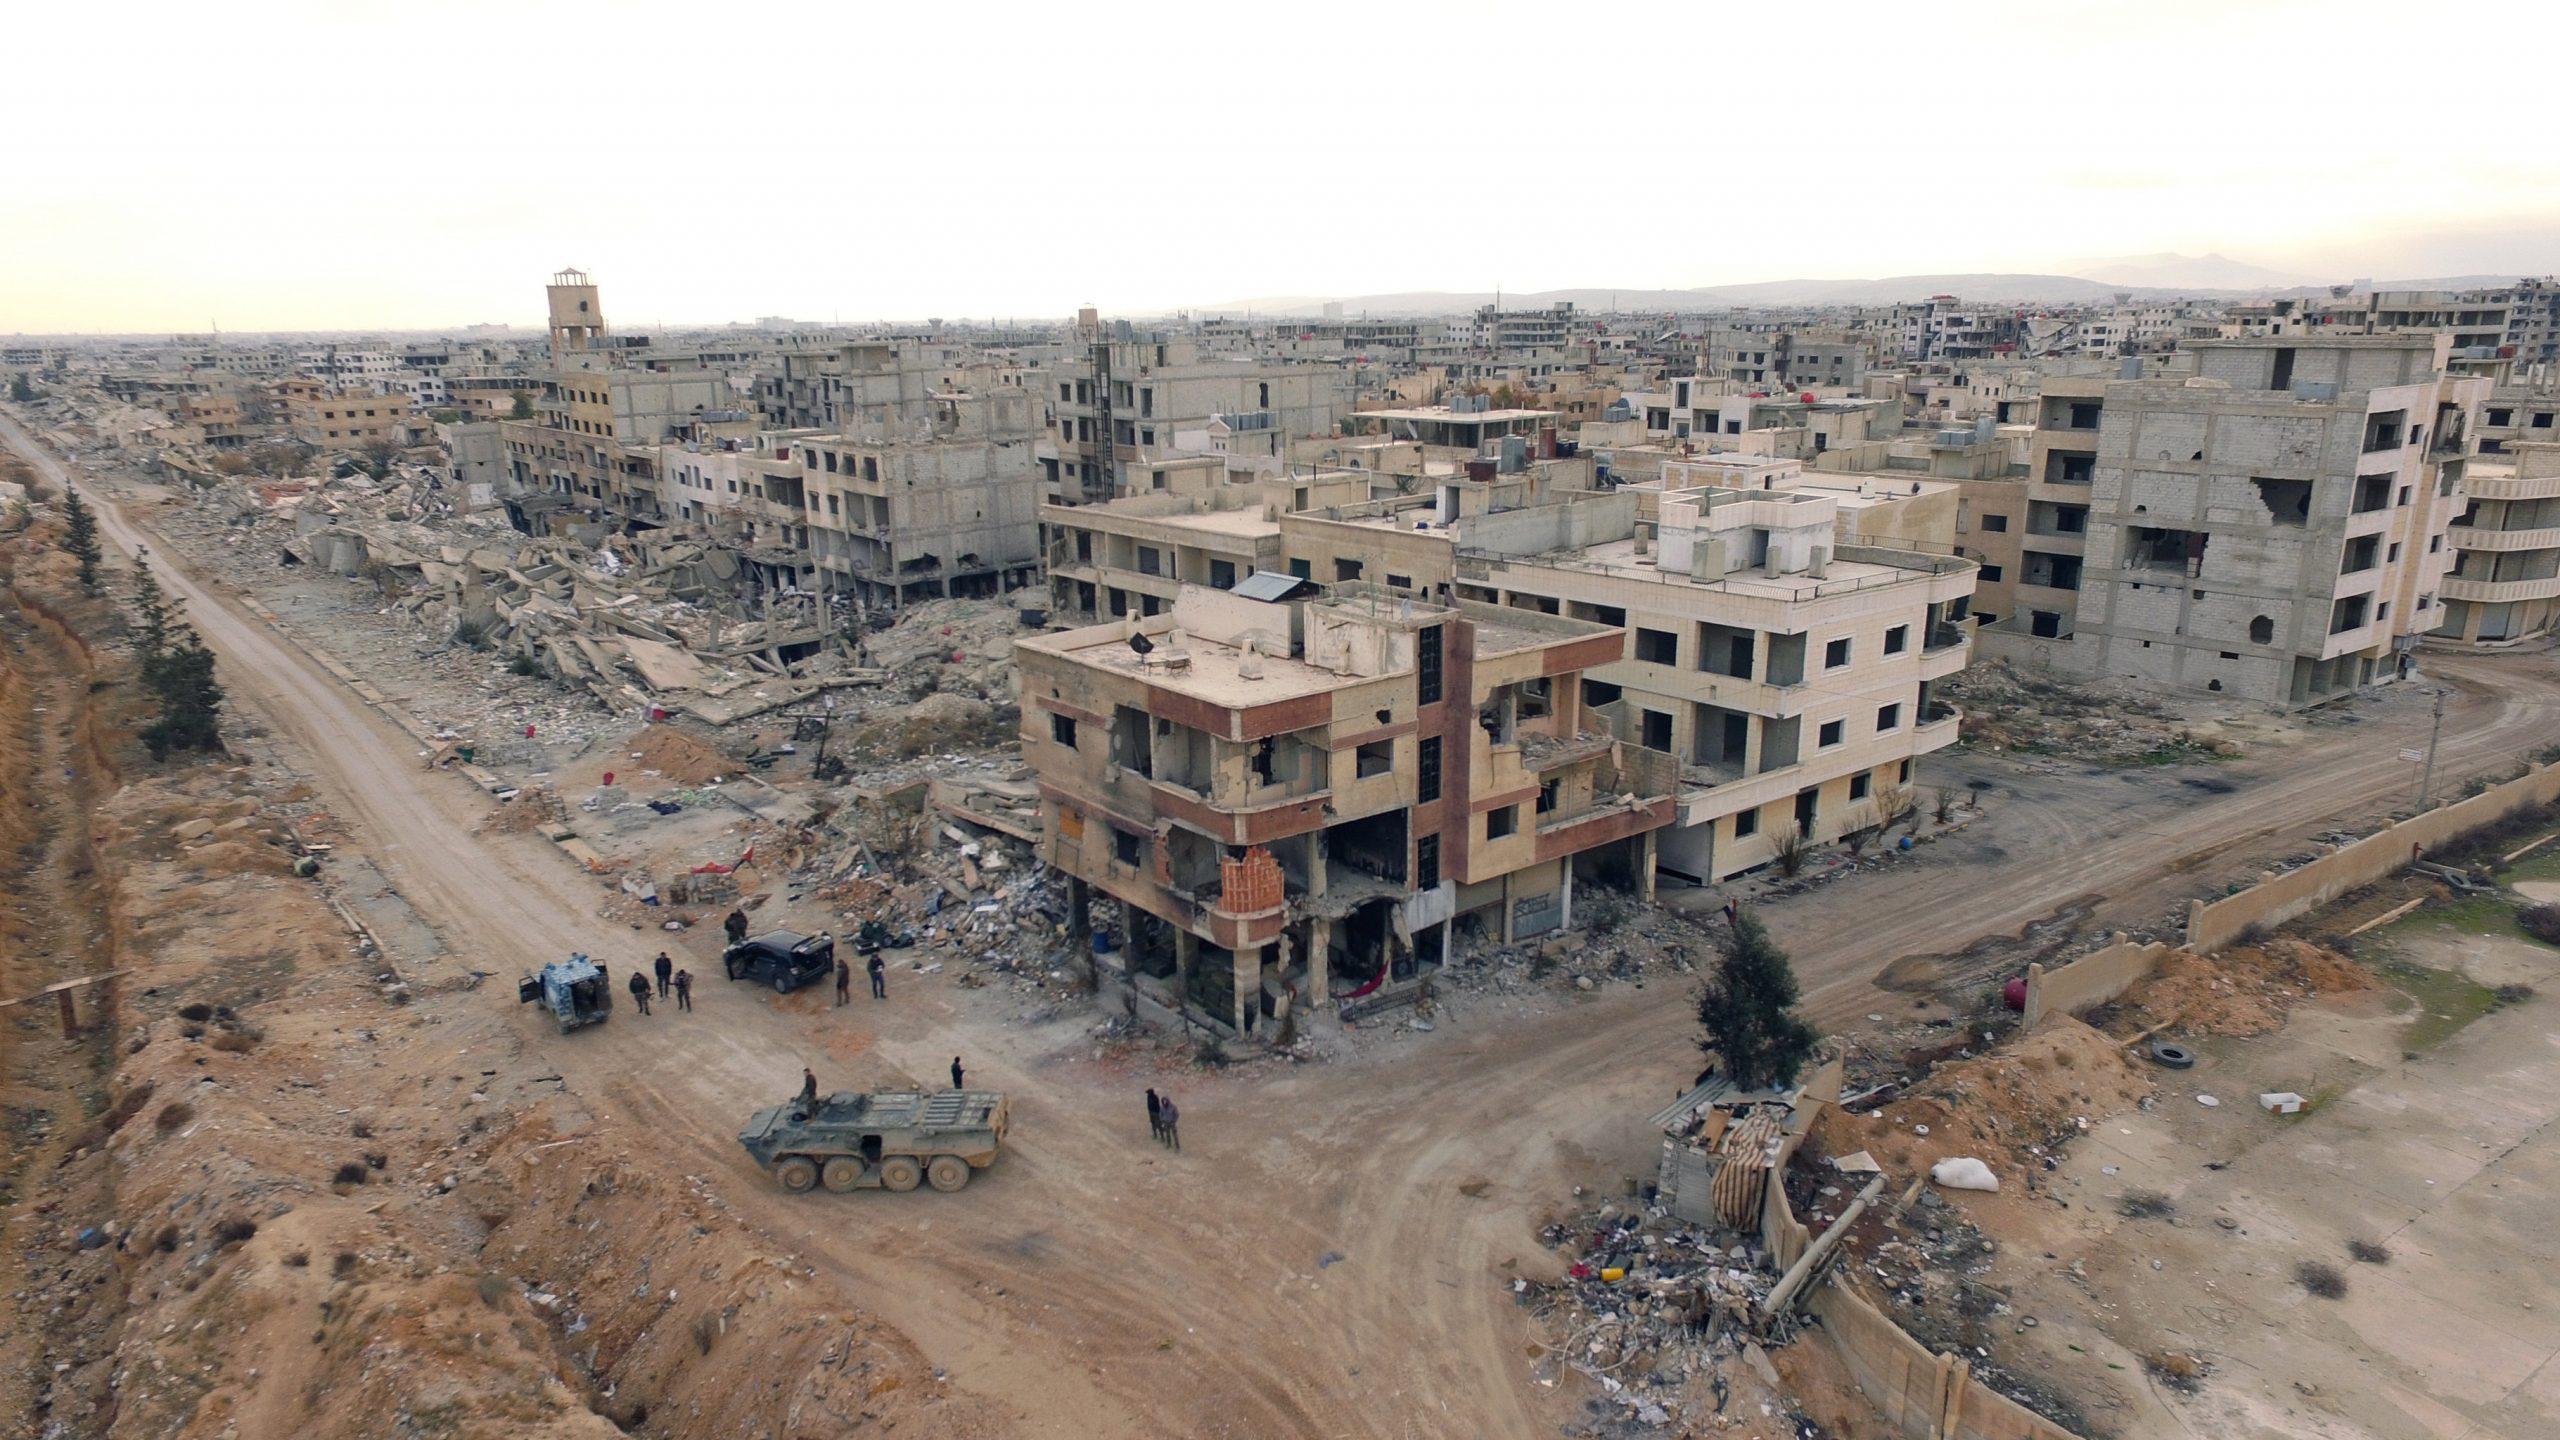 مدينة داريا بريف دمشق